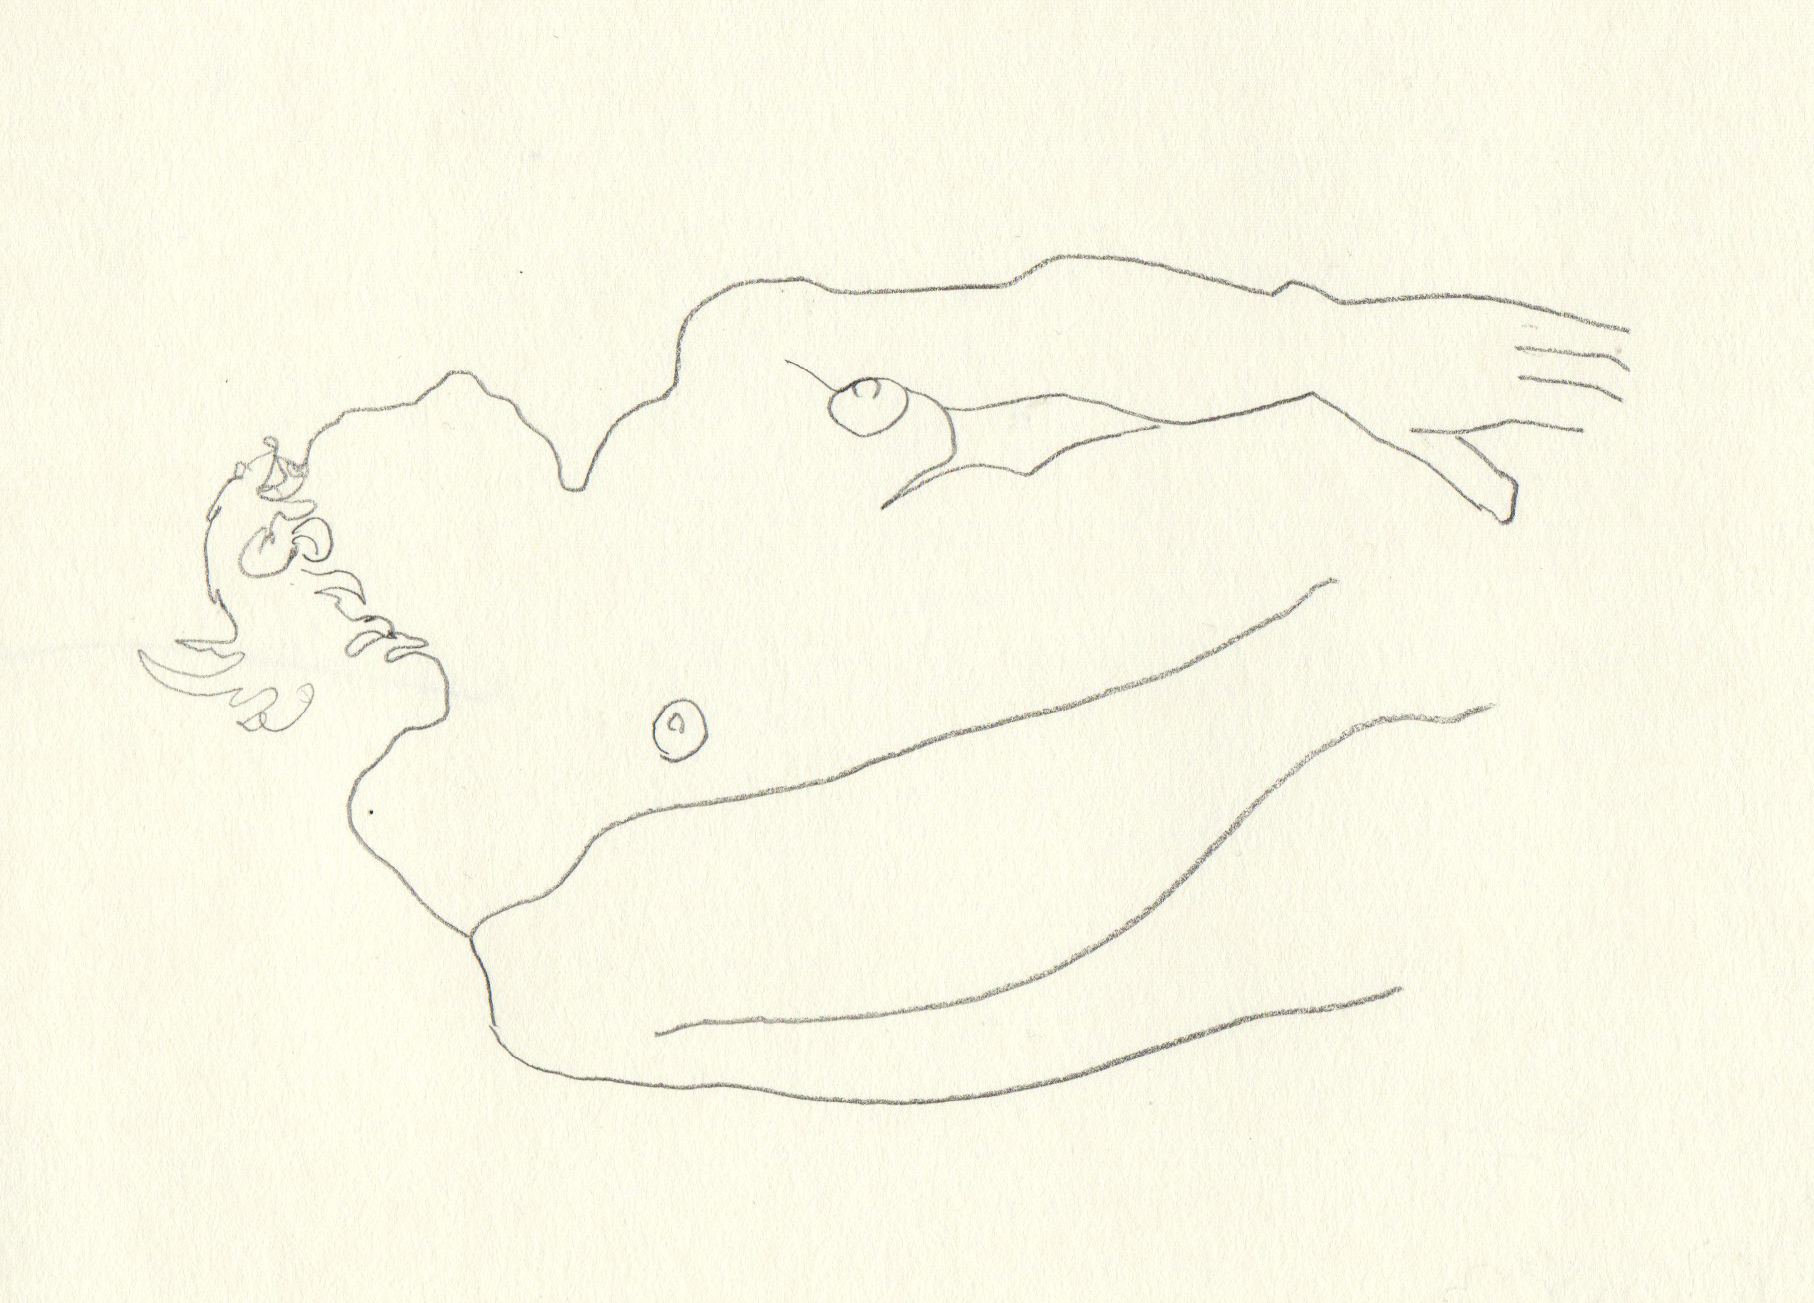 2012_Sketch_F-Beudin_071